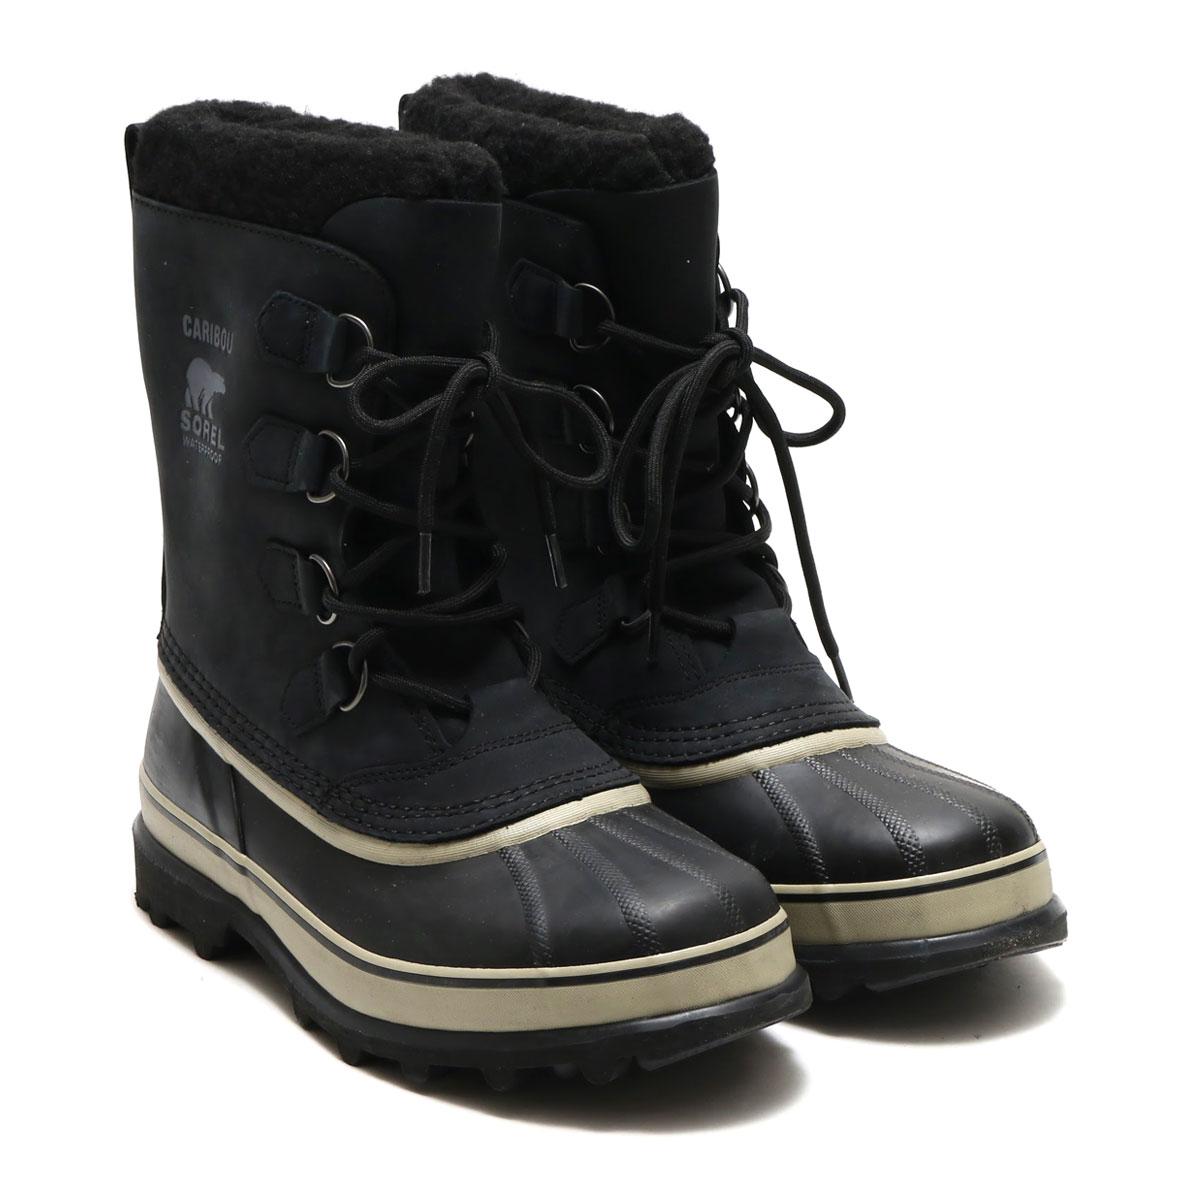 SOREL CARIBOU(ソレル カリブー)BLACK/TUSK【メンズ ブーツ】17HO-I